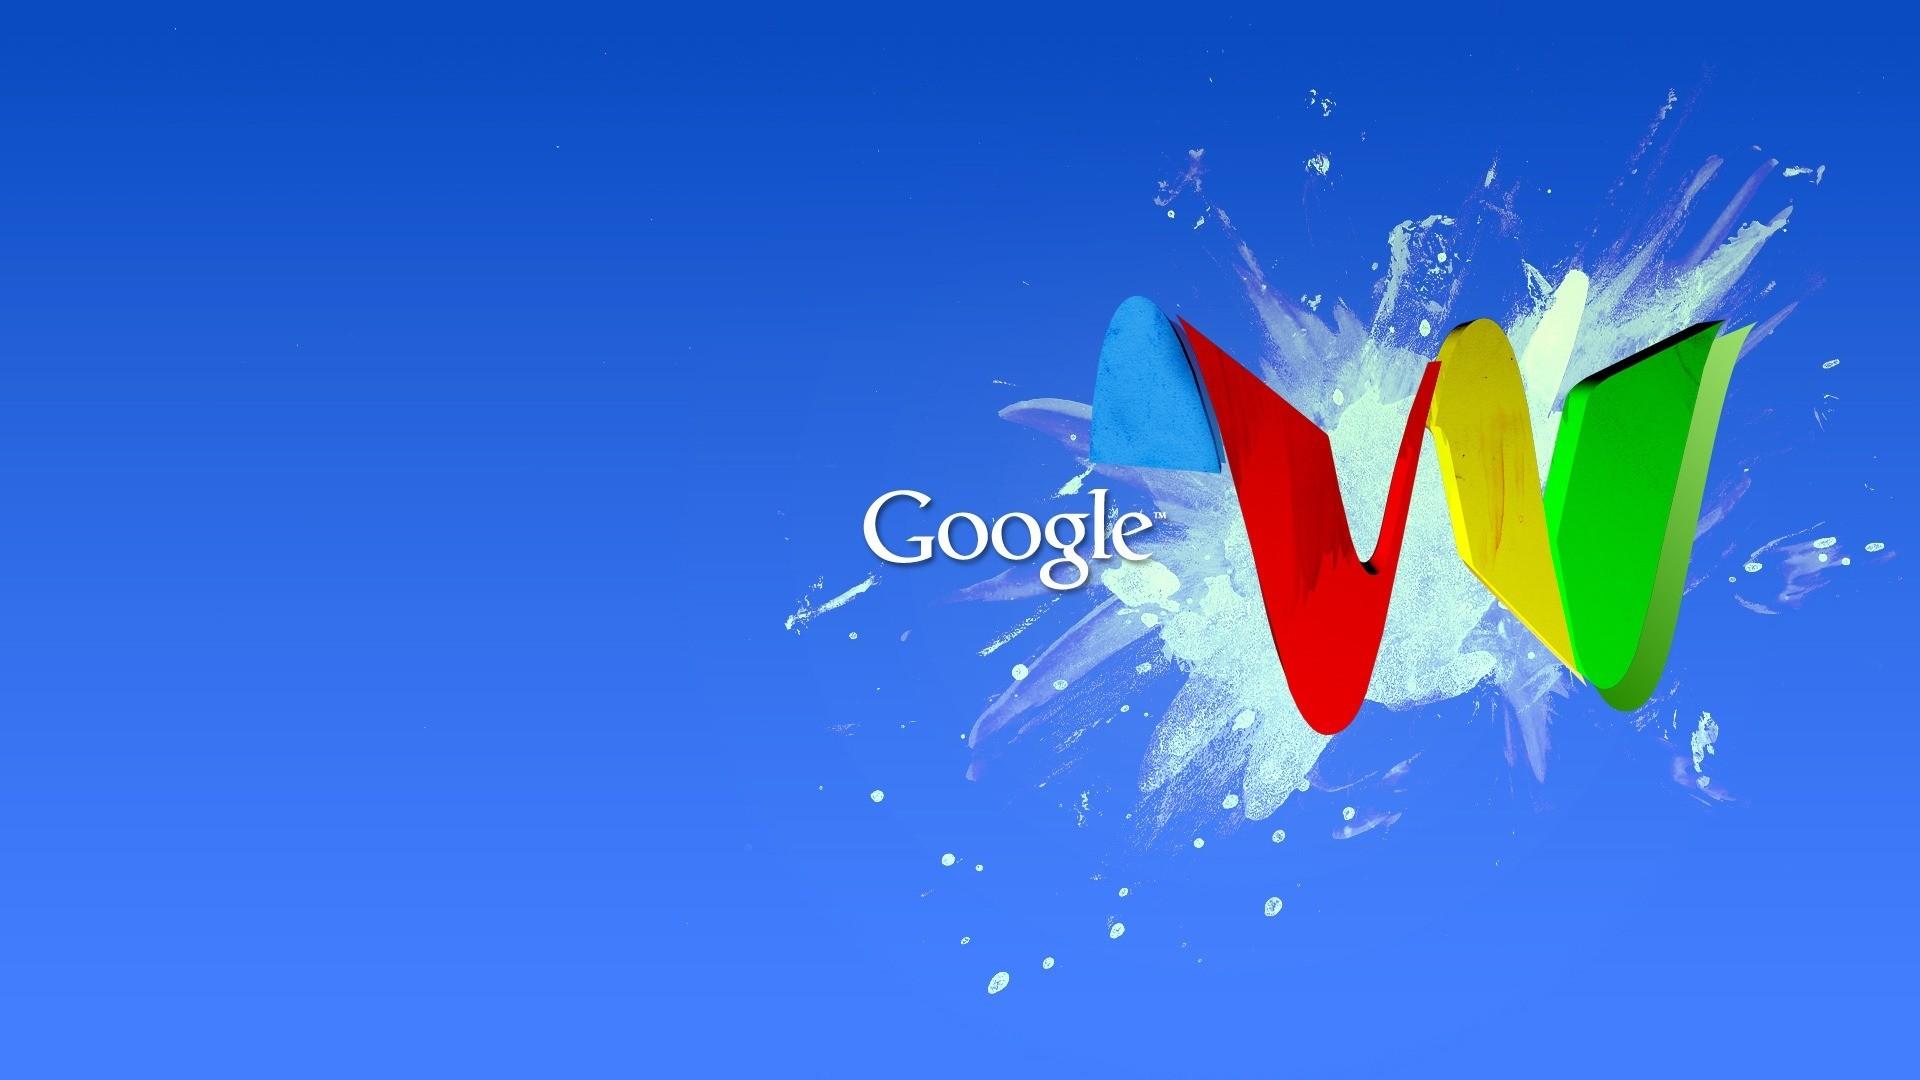 google wallpaper background (65+ images)